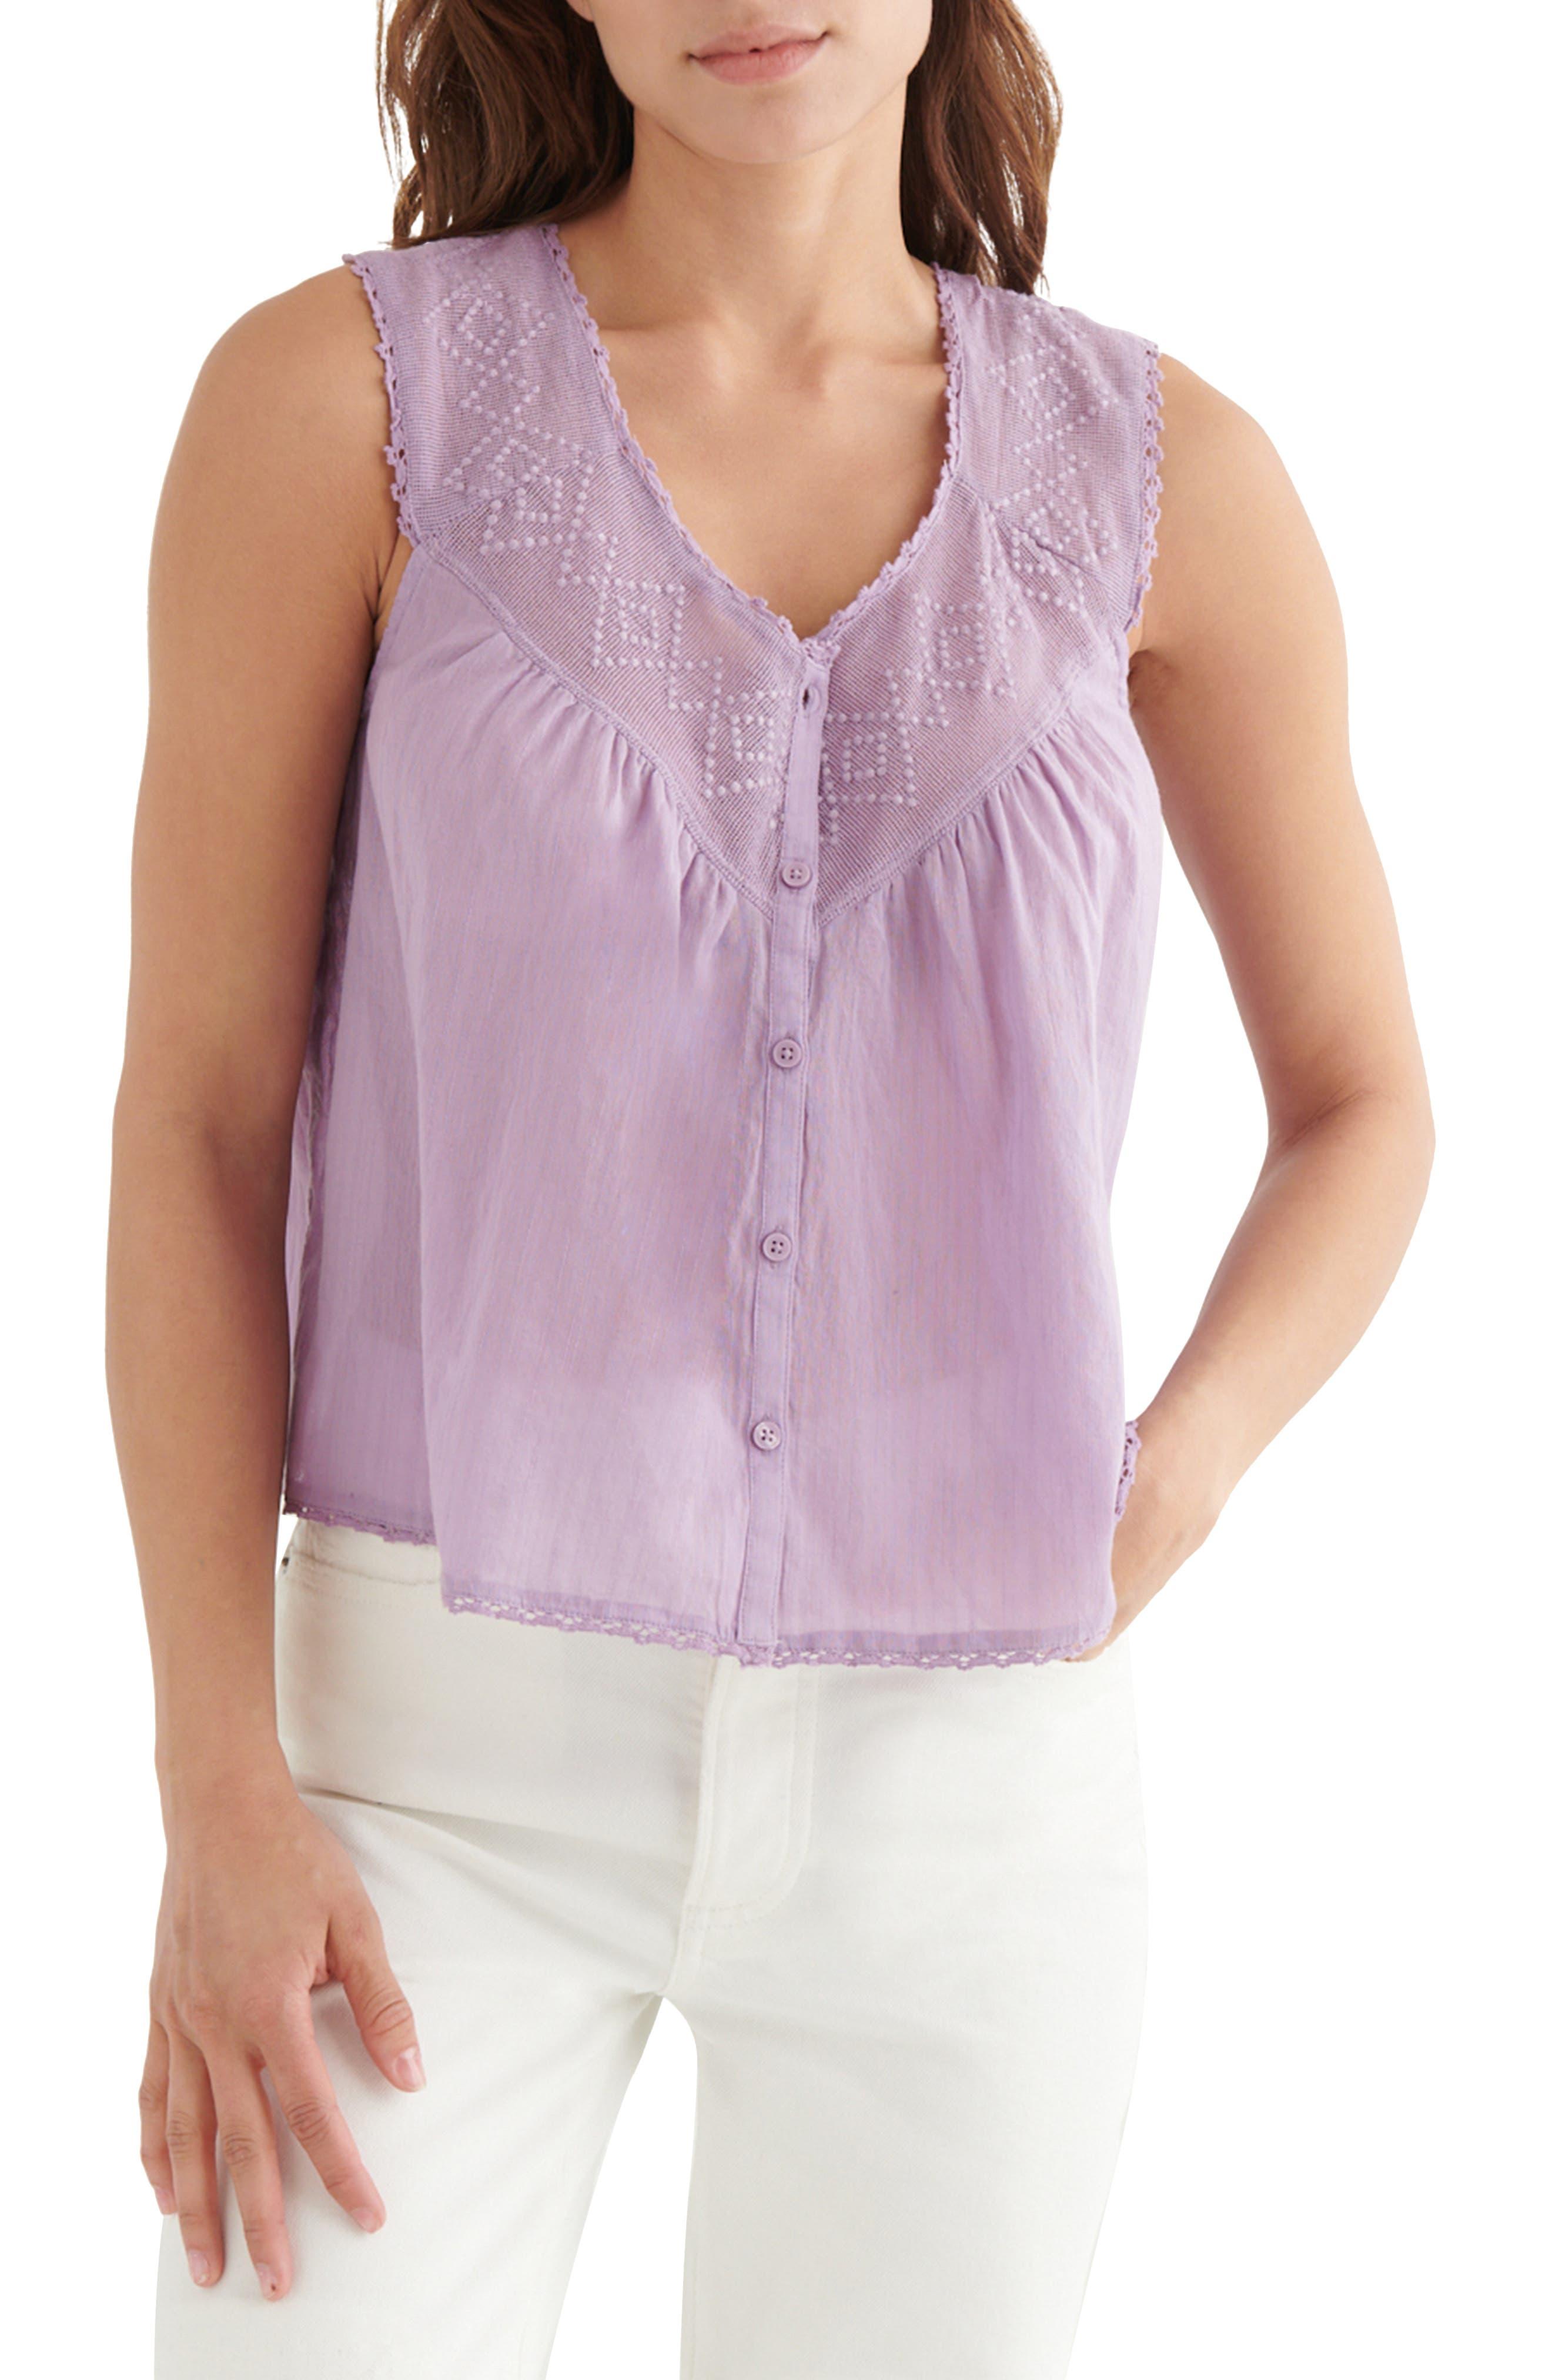 Embroidered Yoke Sleeveless Cotton Top